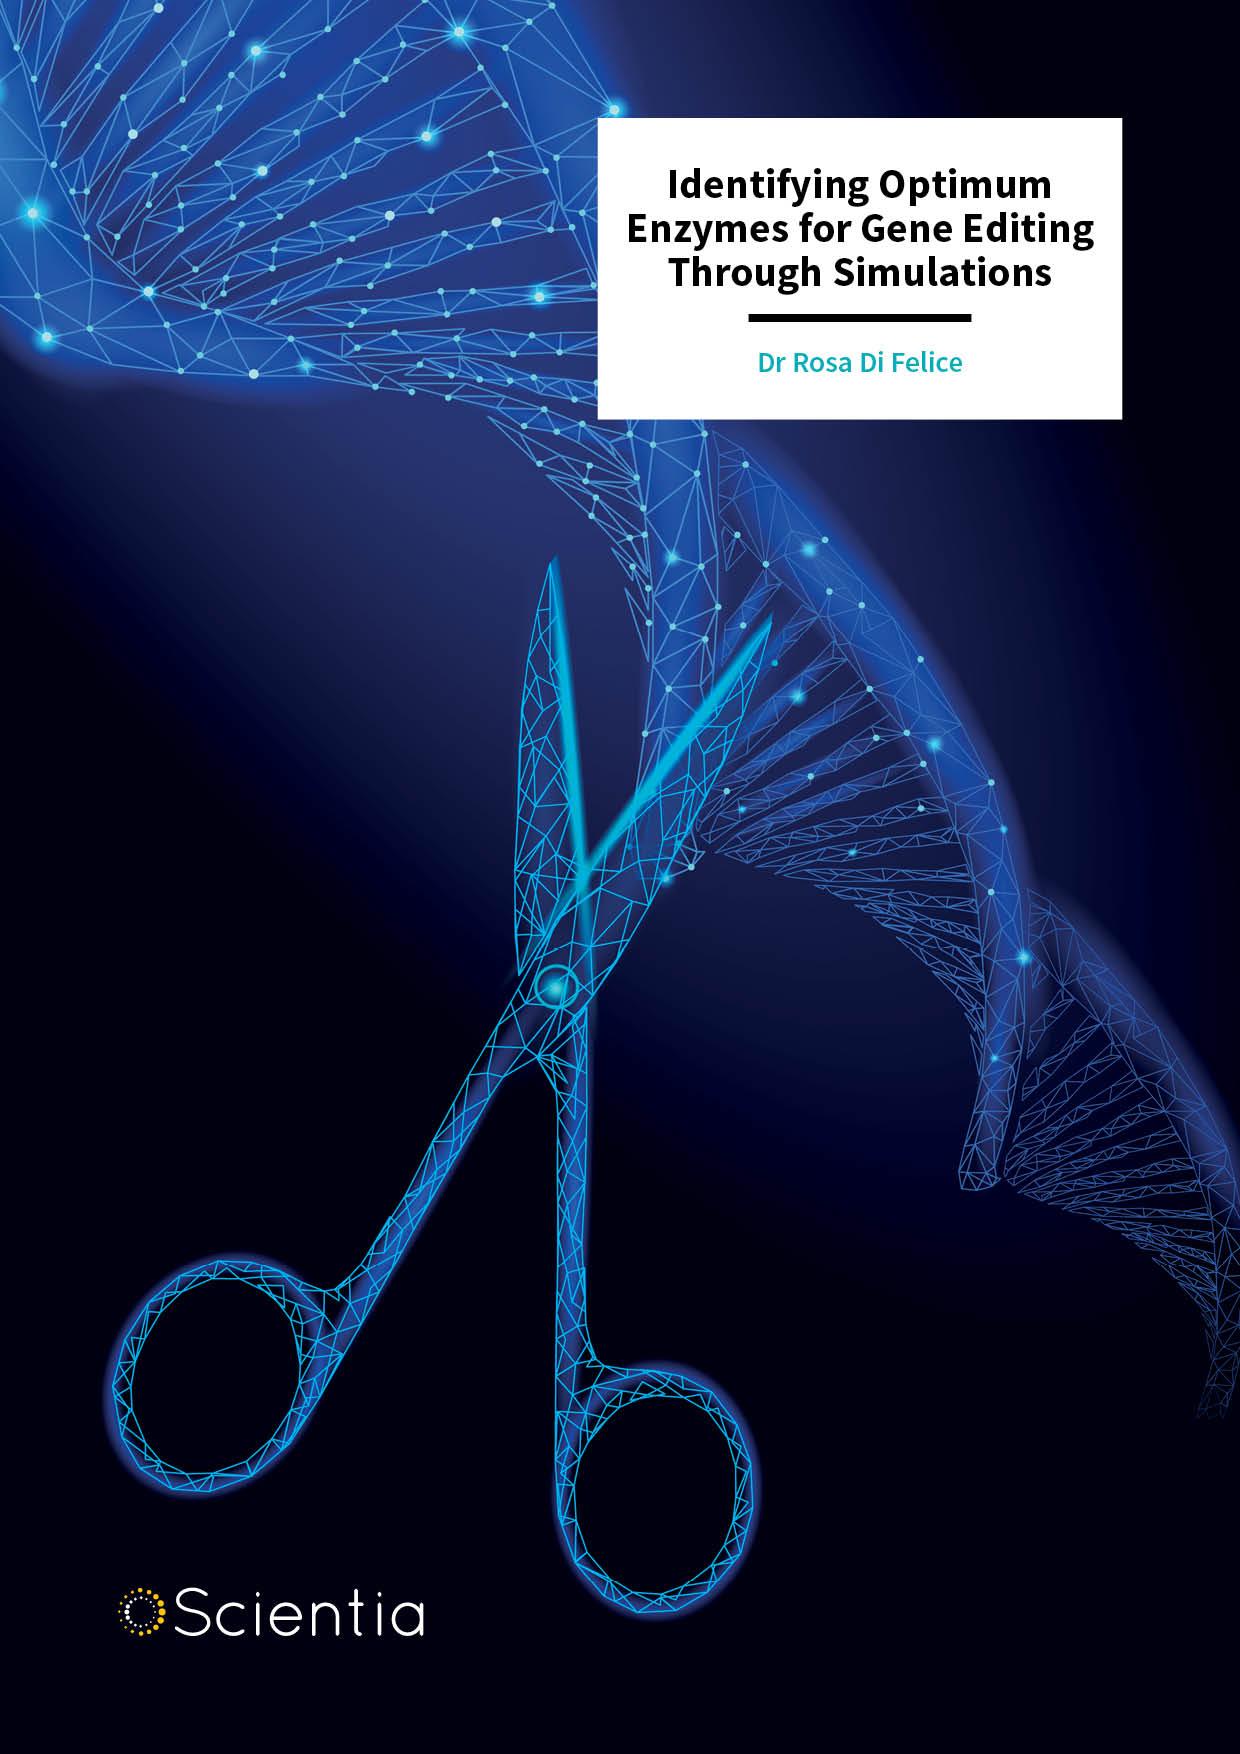 Dr Rosa Di Felice – Identifying Optimum Enzymes for Gene Editing Through Simulations